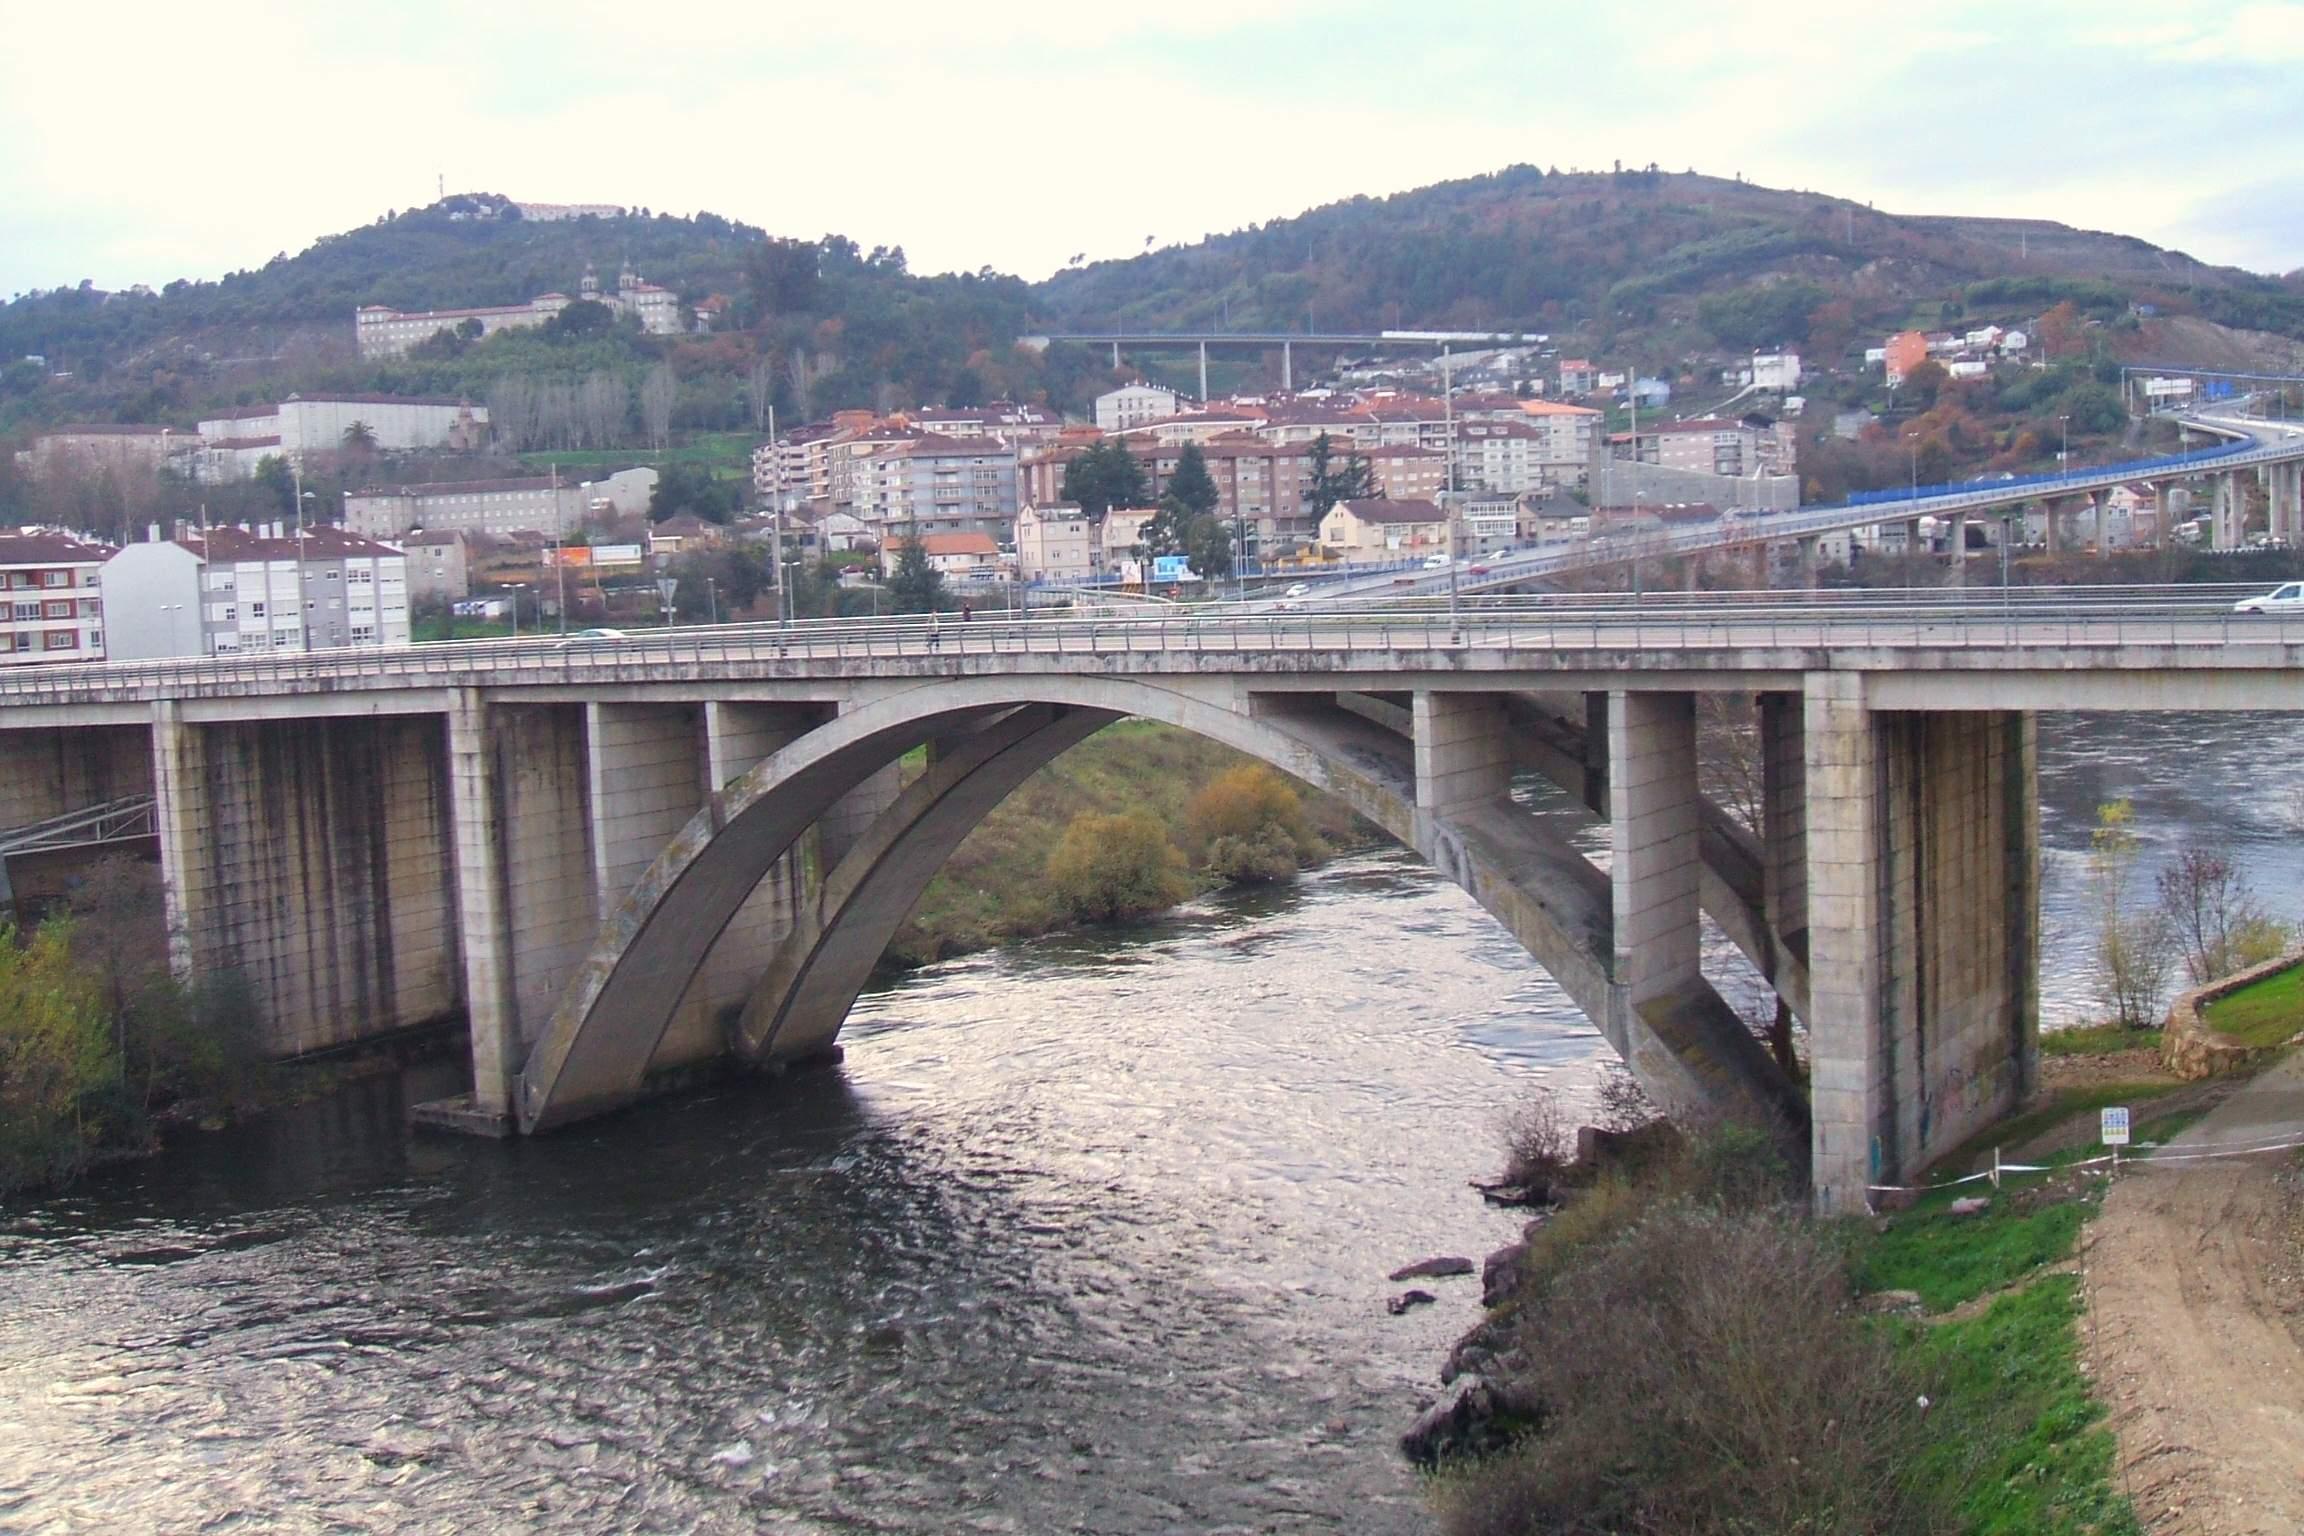 File:Orense - Puente.jpg - Wikimedia Commons